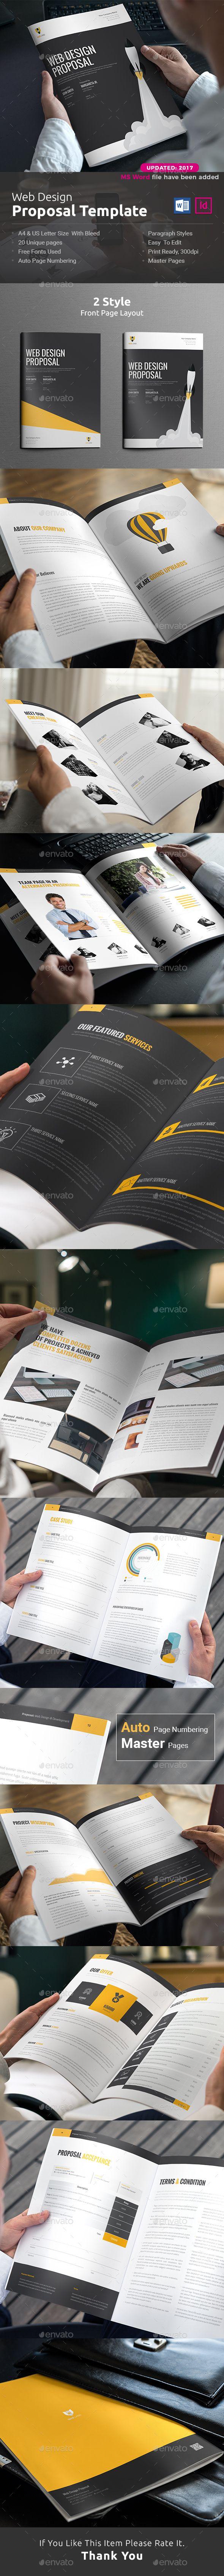 Web Design Proposal Word | Pinterest | Proposals, Proposal templates ...